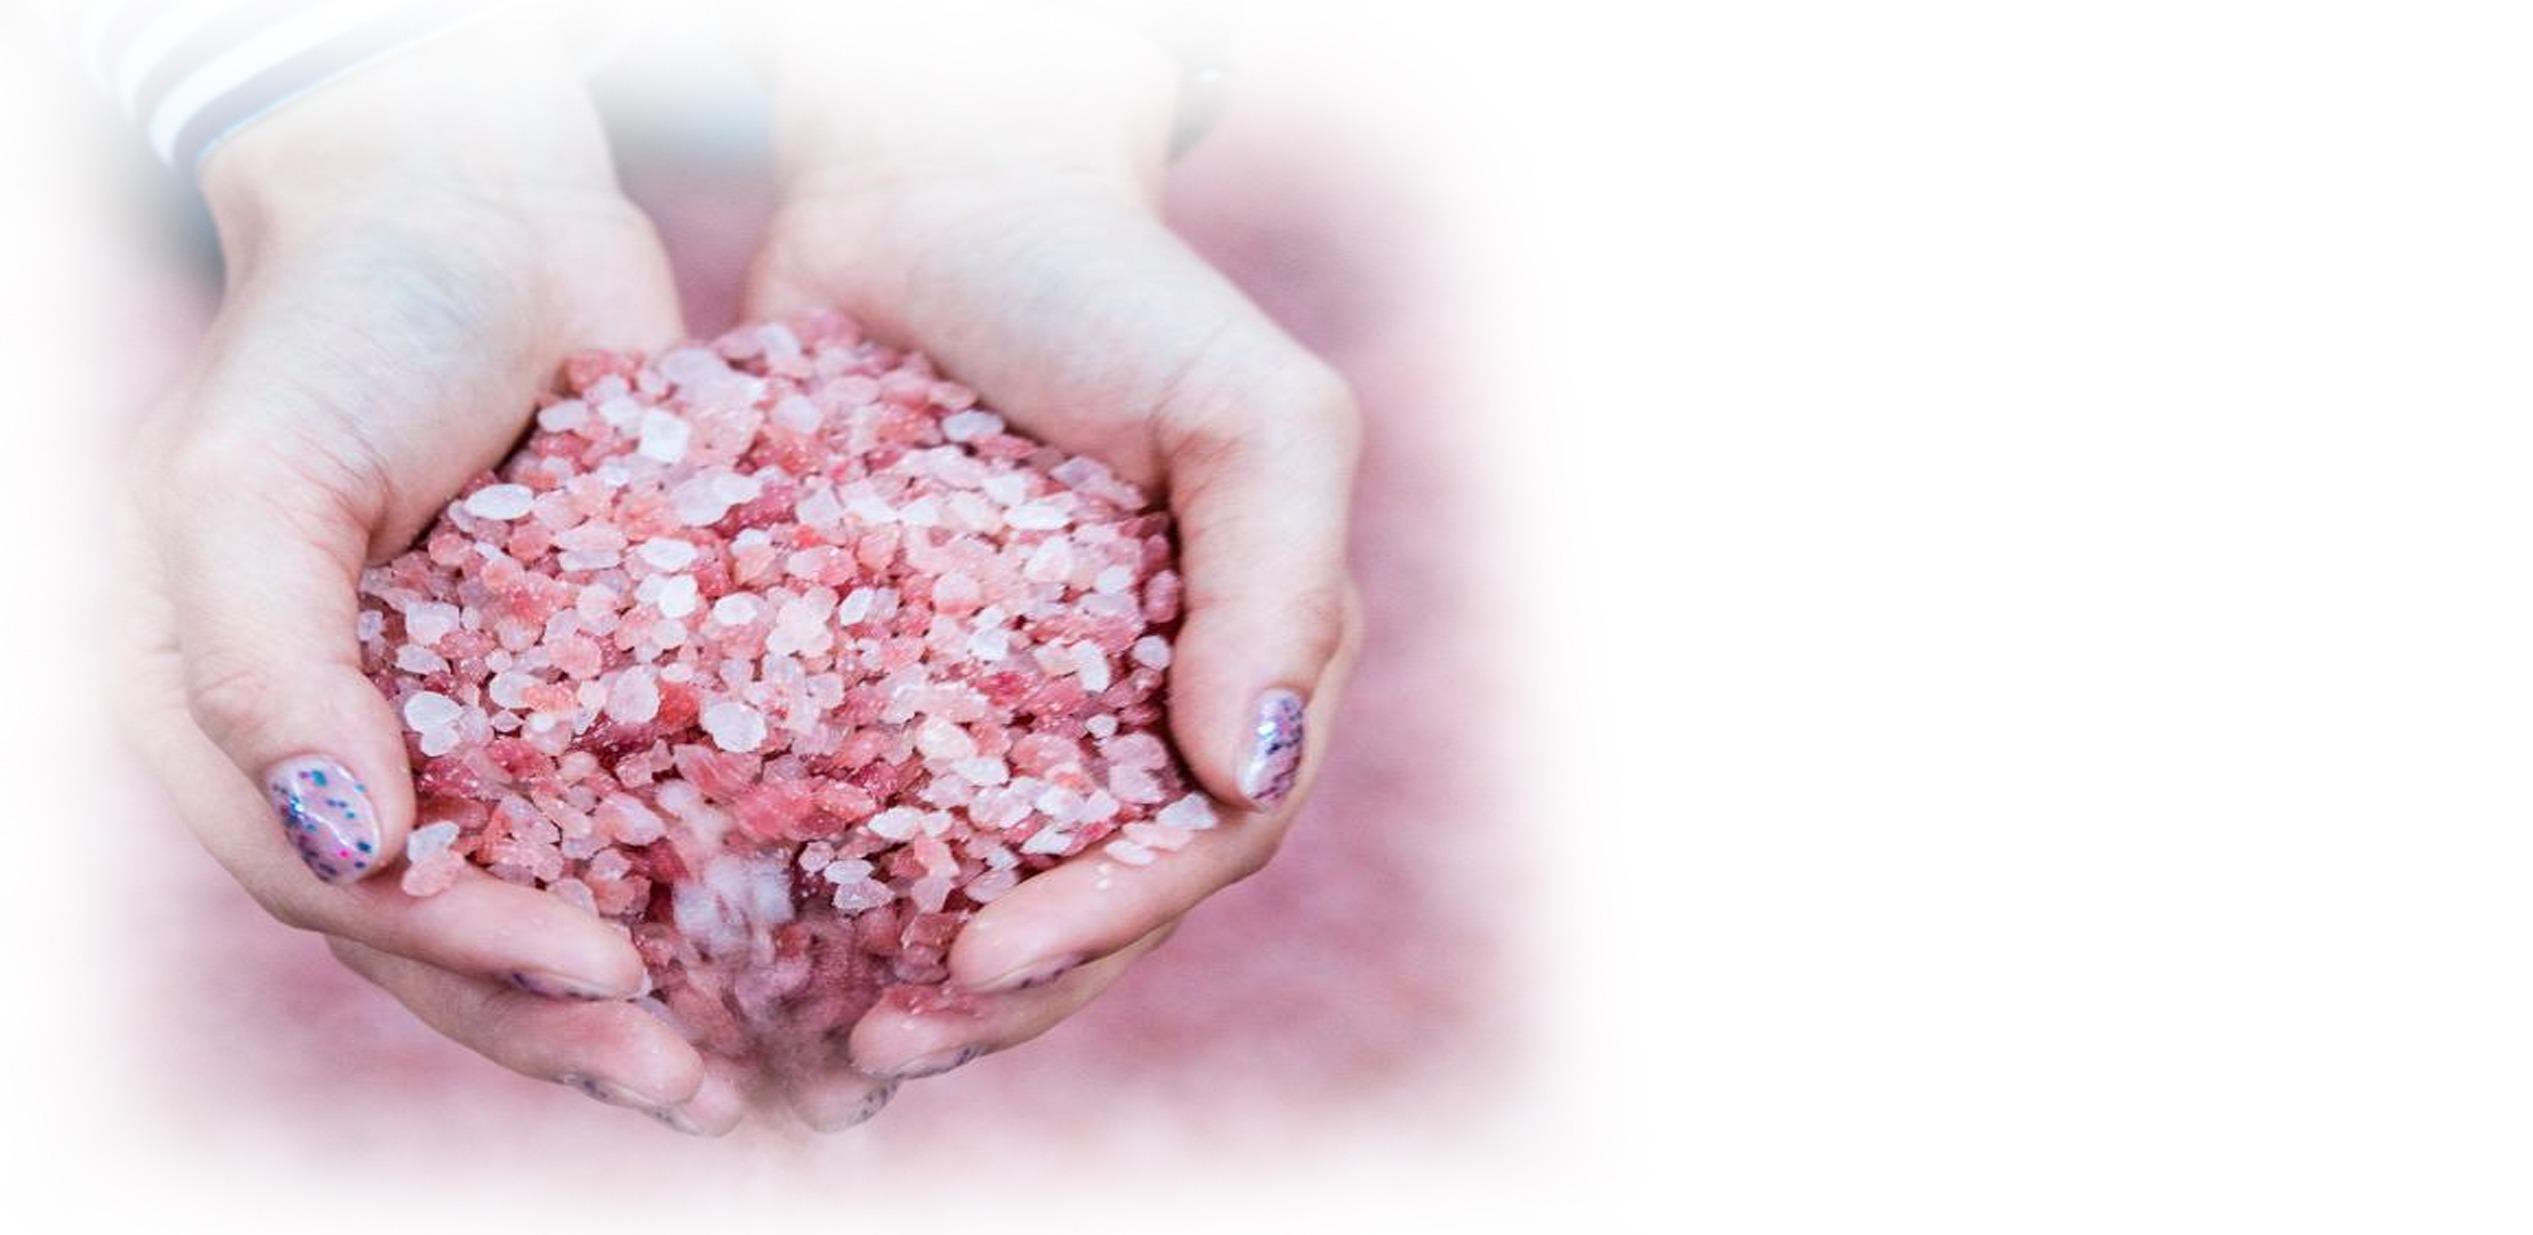 Himalayan Salt Lamp 3 5kg Kilkenny Salt Therapy